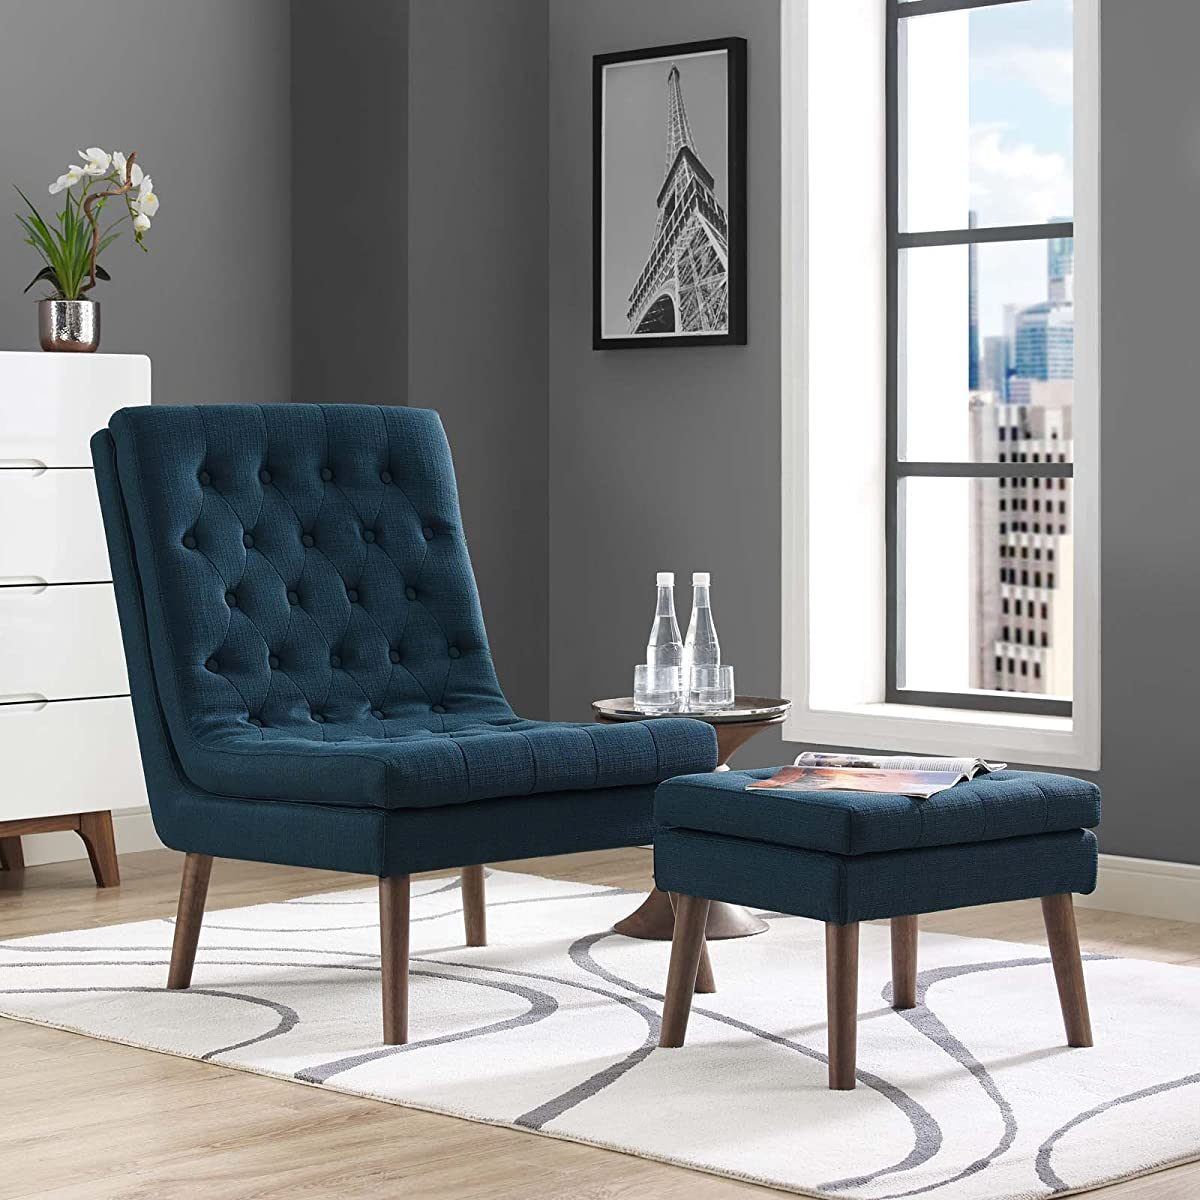 Modway EEI-2988-AZU Modify Upholstered Lounge Chair and Ottoman, Azure